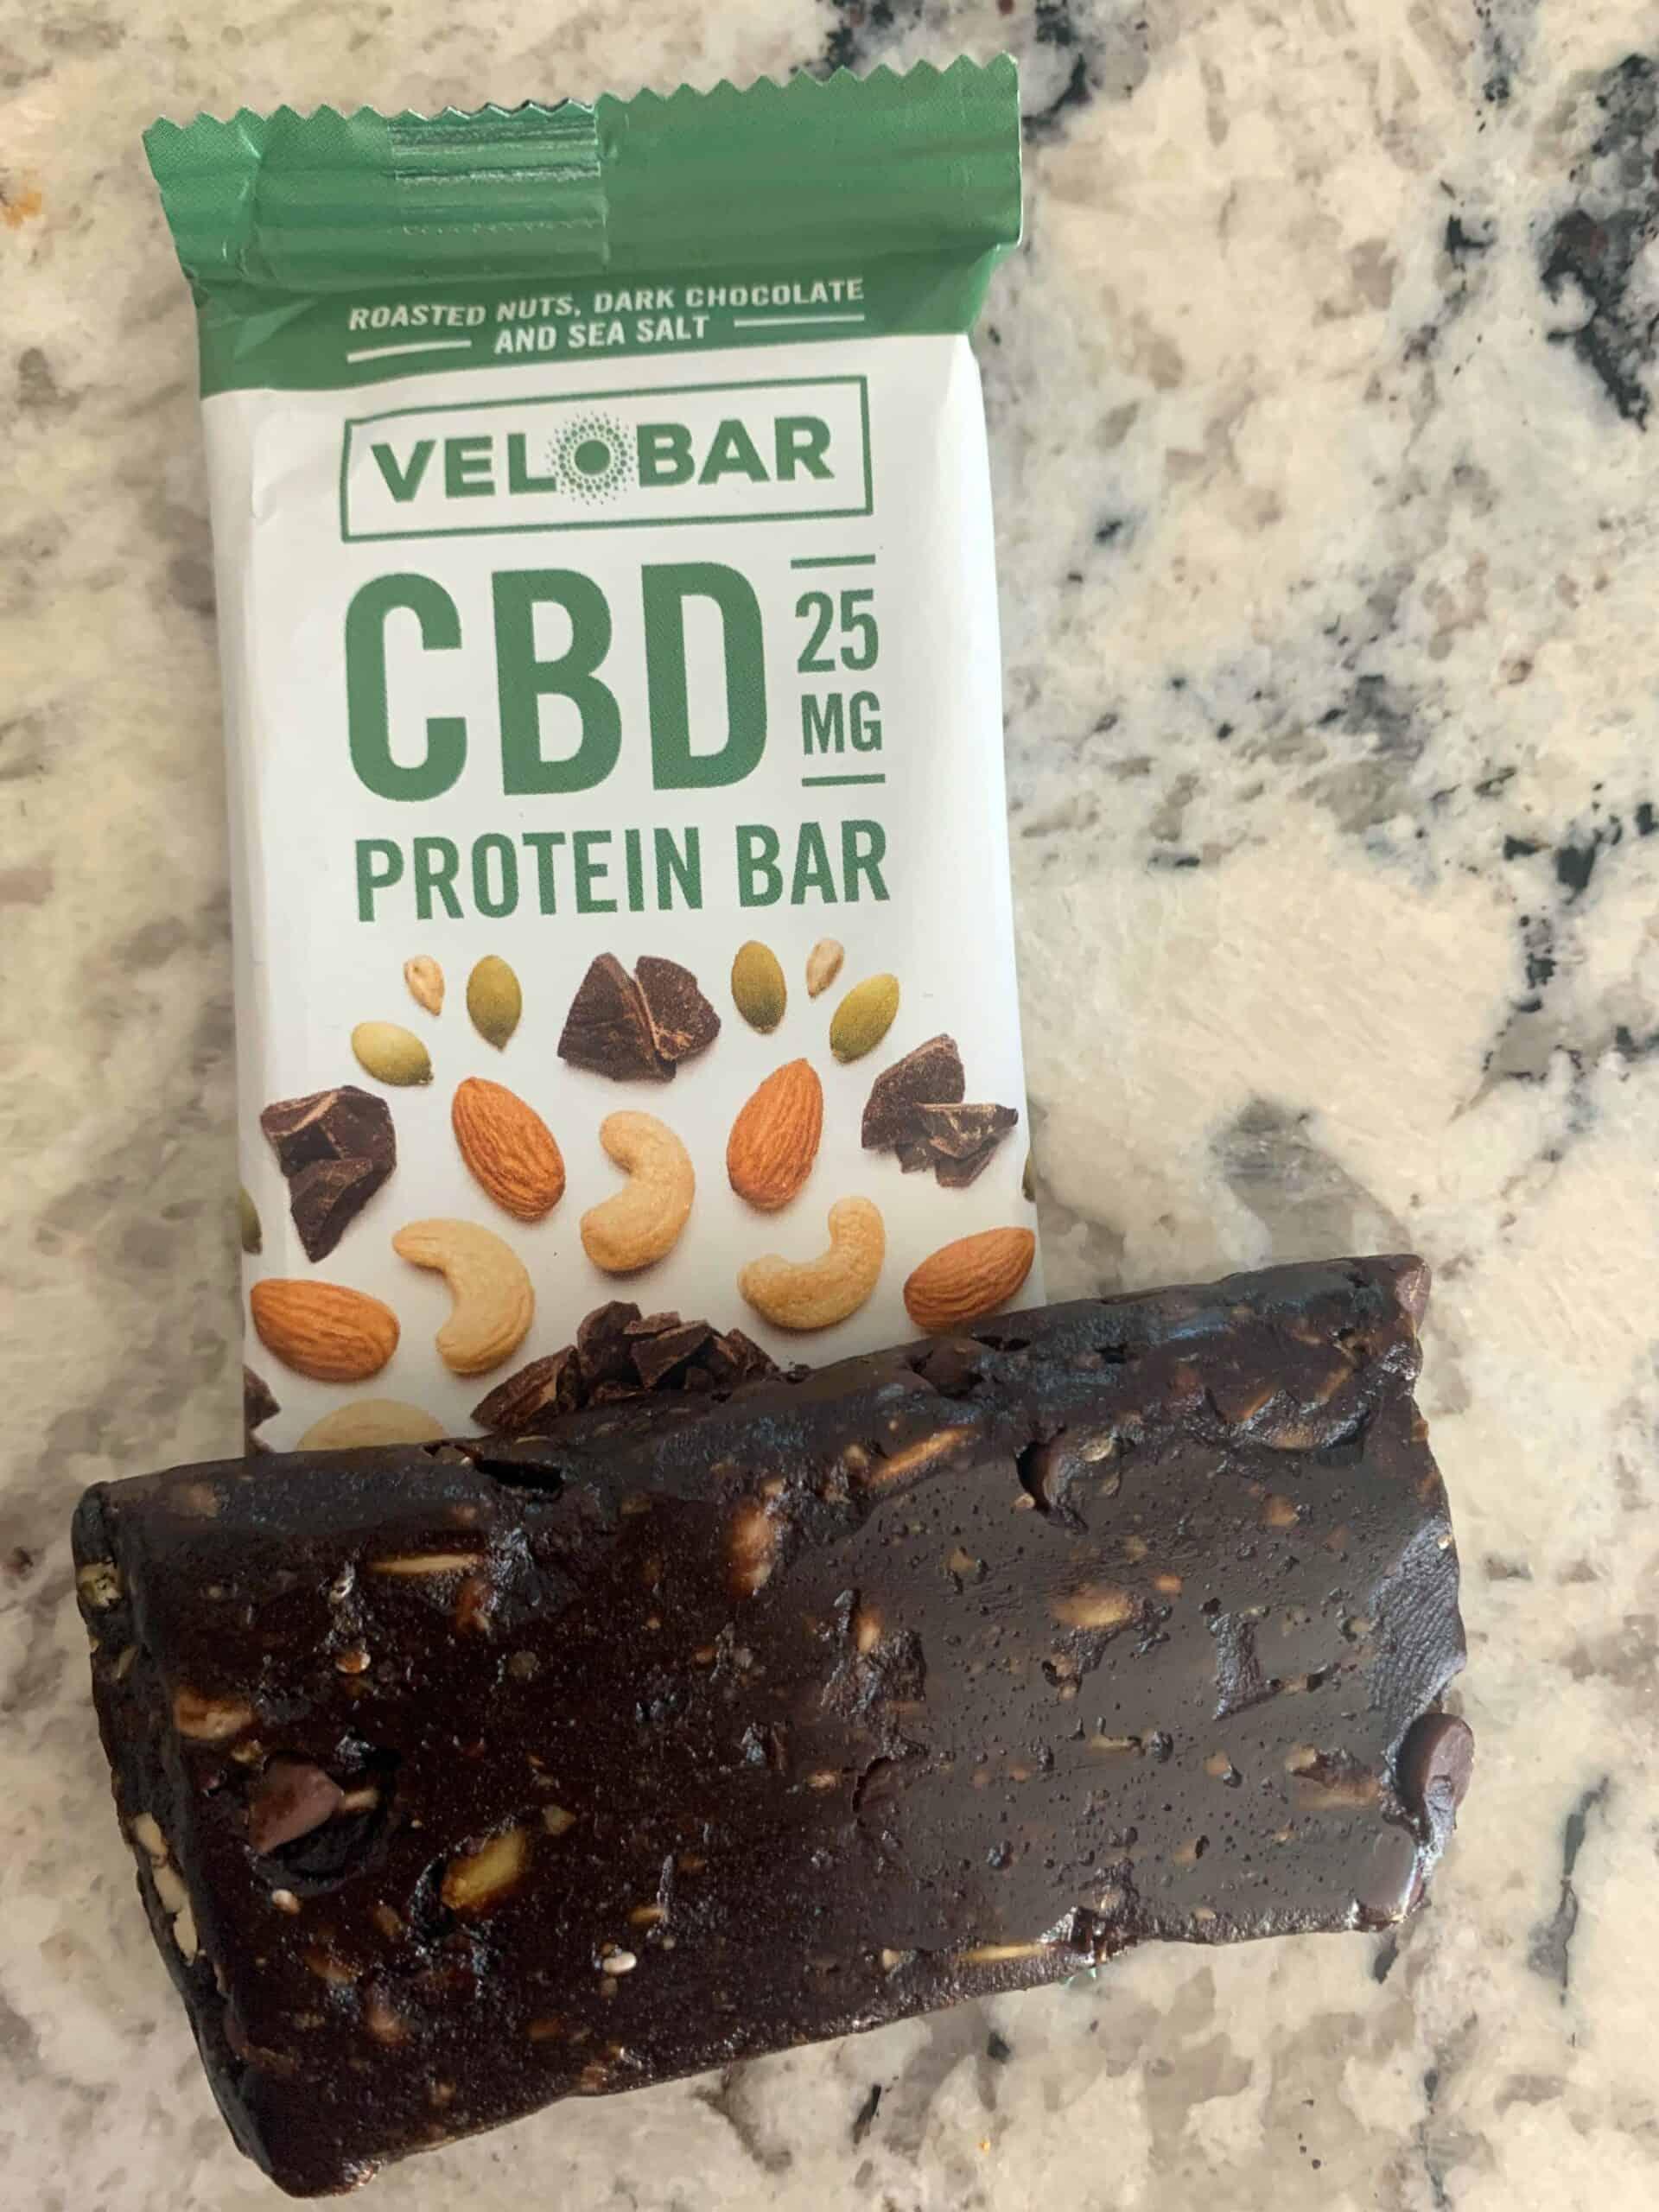 Velobar dark chocolate CBD protein bar 25mg review save on cannabis testing process